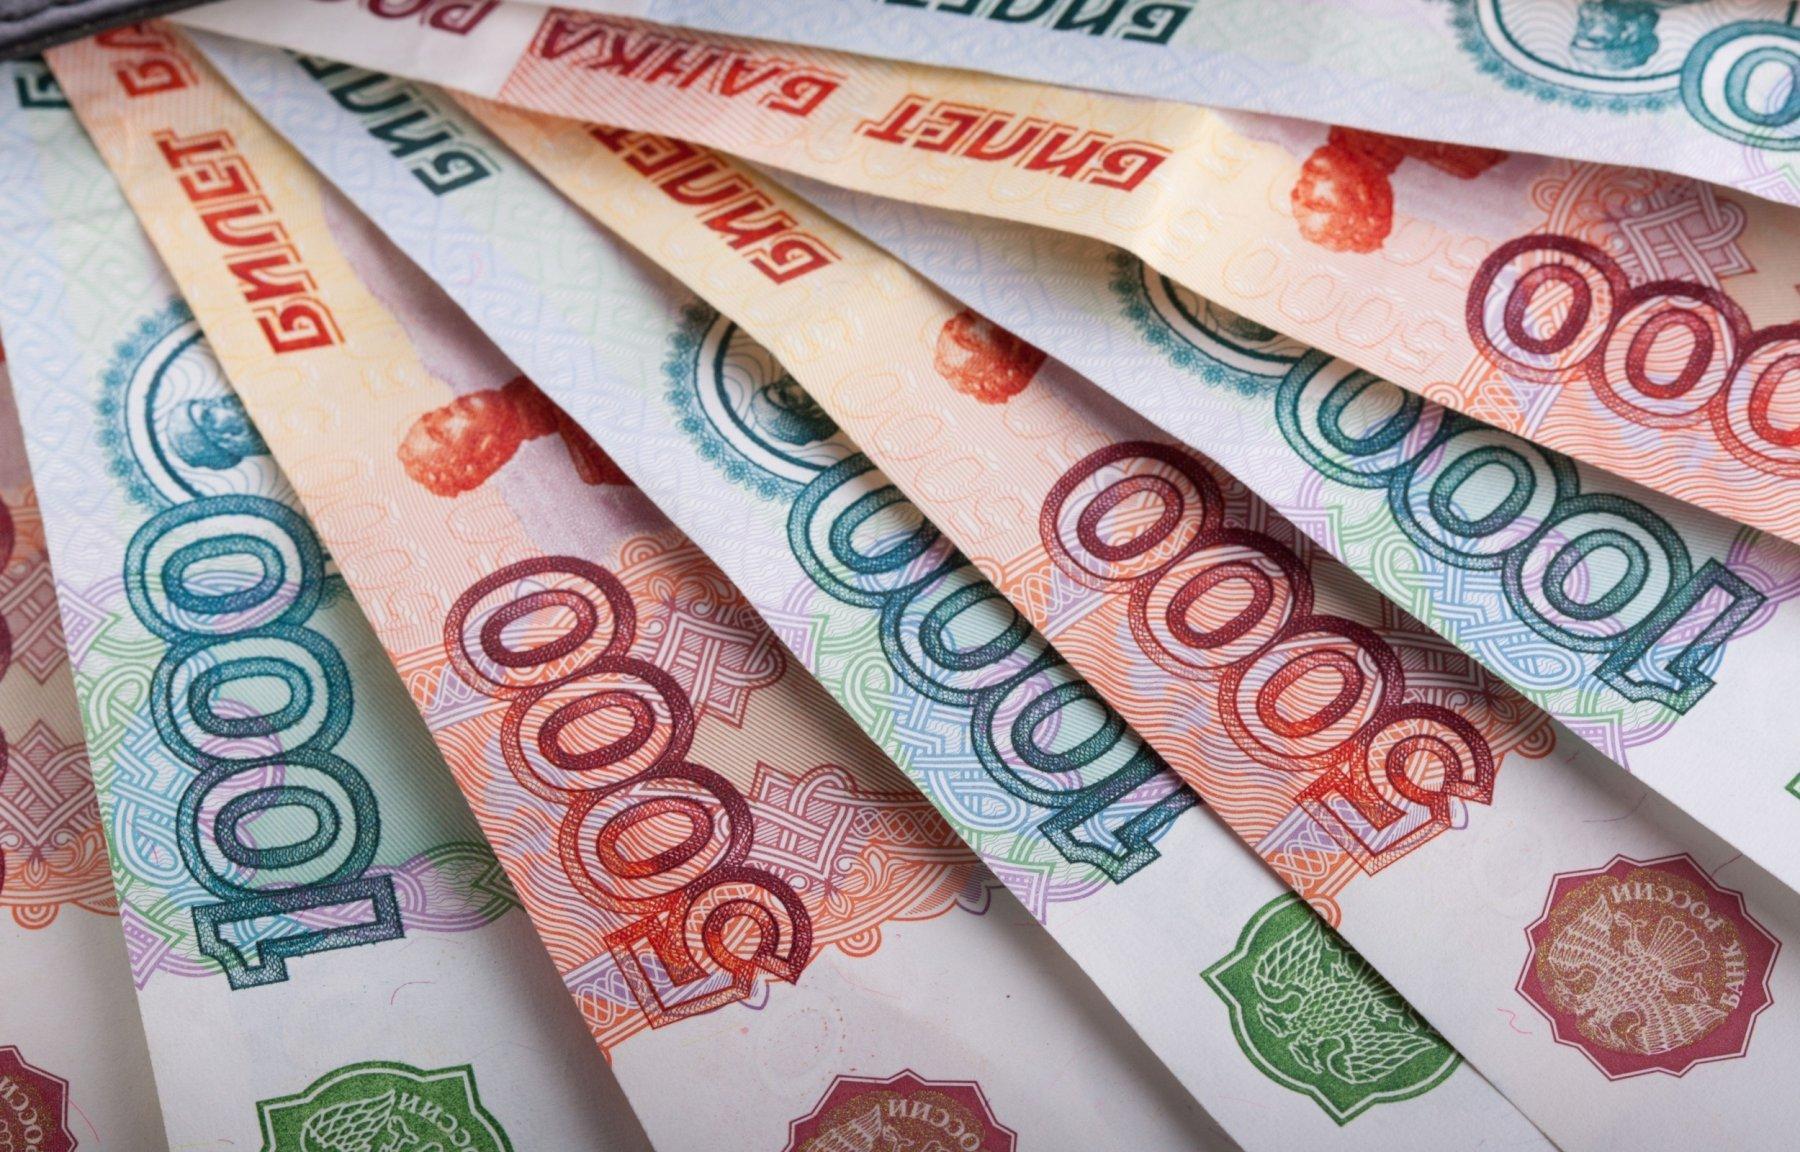 Россиянам пообещали резкий рост пенсий уже в 2020-м - новости Афанасий